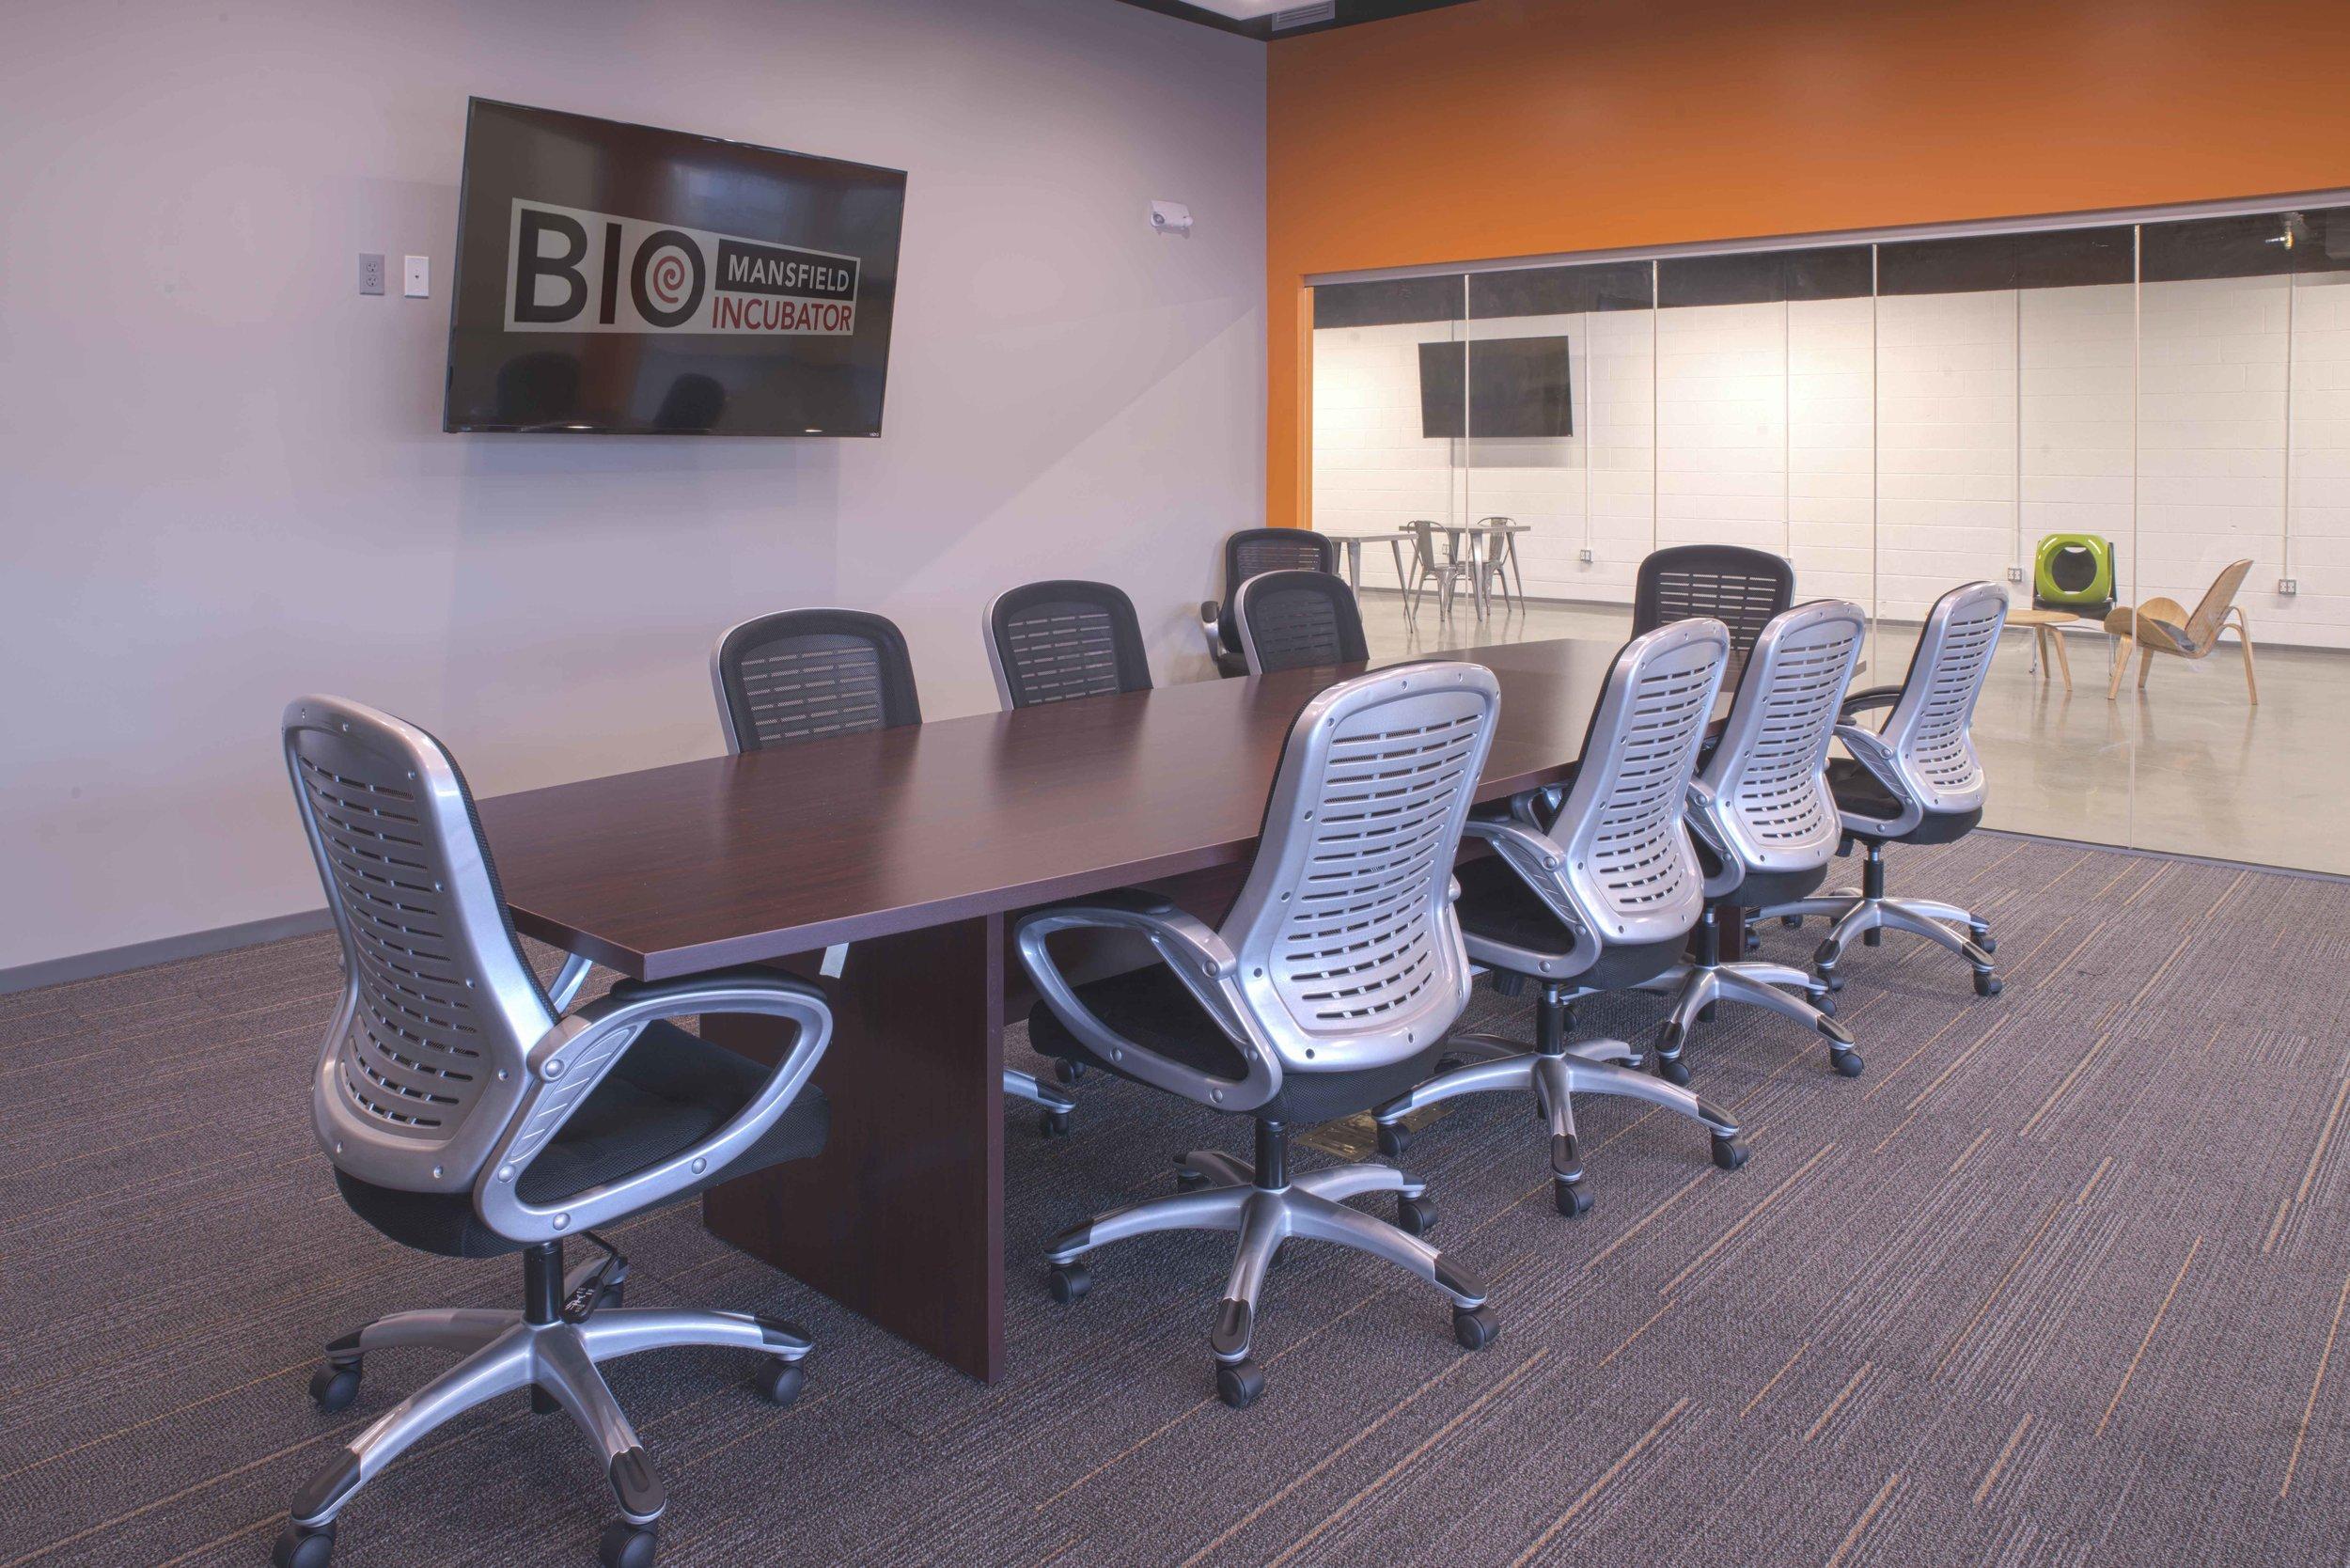 Conference room, interior.